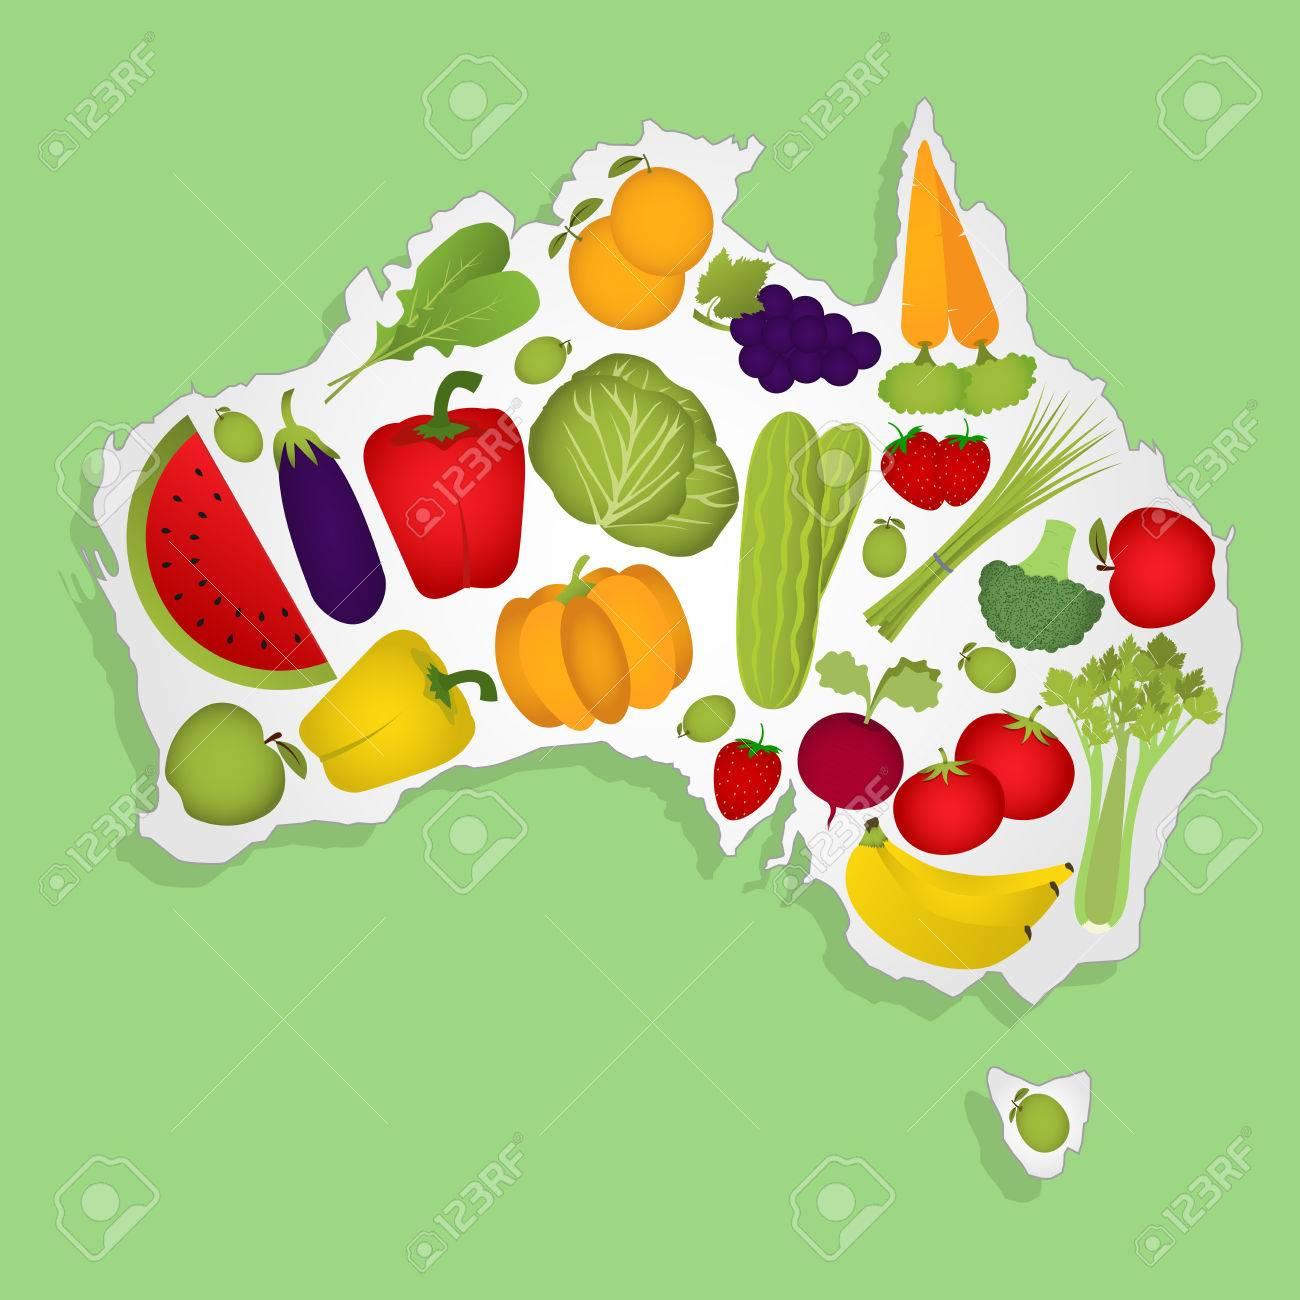 Map Of Australia Full Of Fruits And Vegetables Royalty Free – Australia Full Map